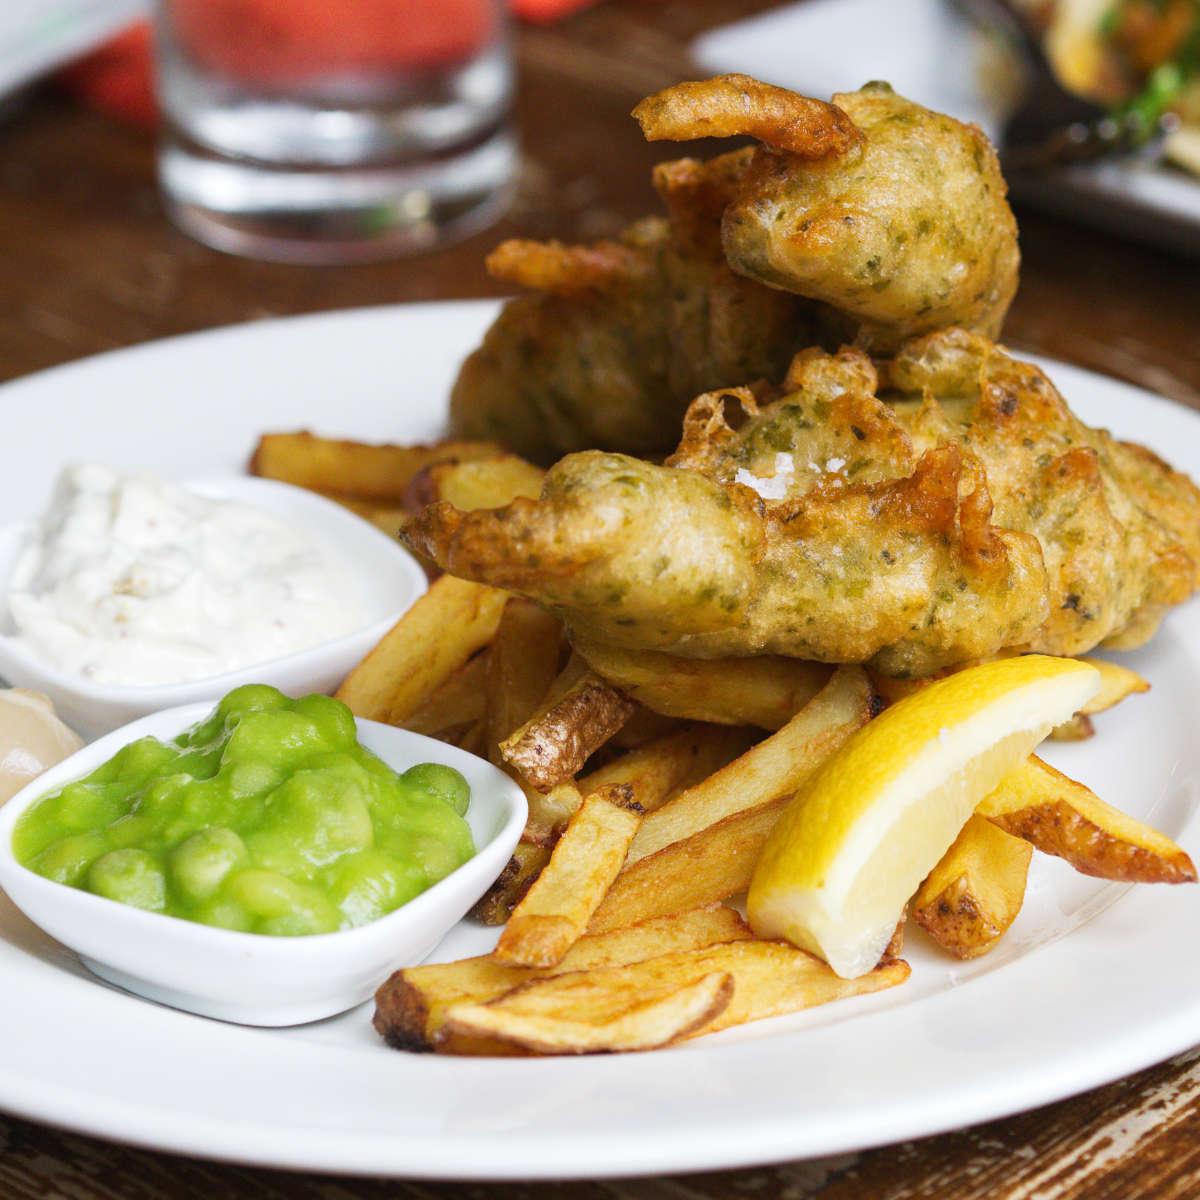 Vegan fish and chips at Harmonium, Edinburgh